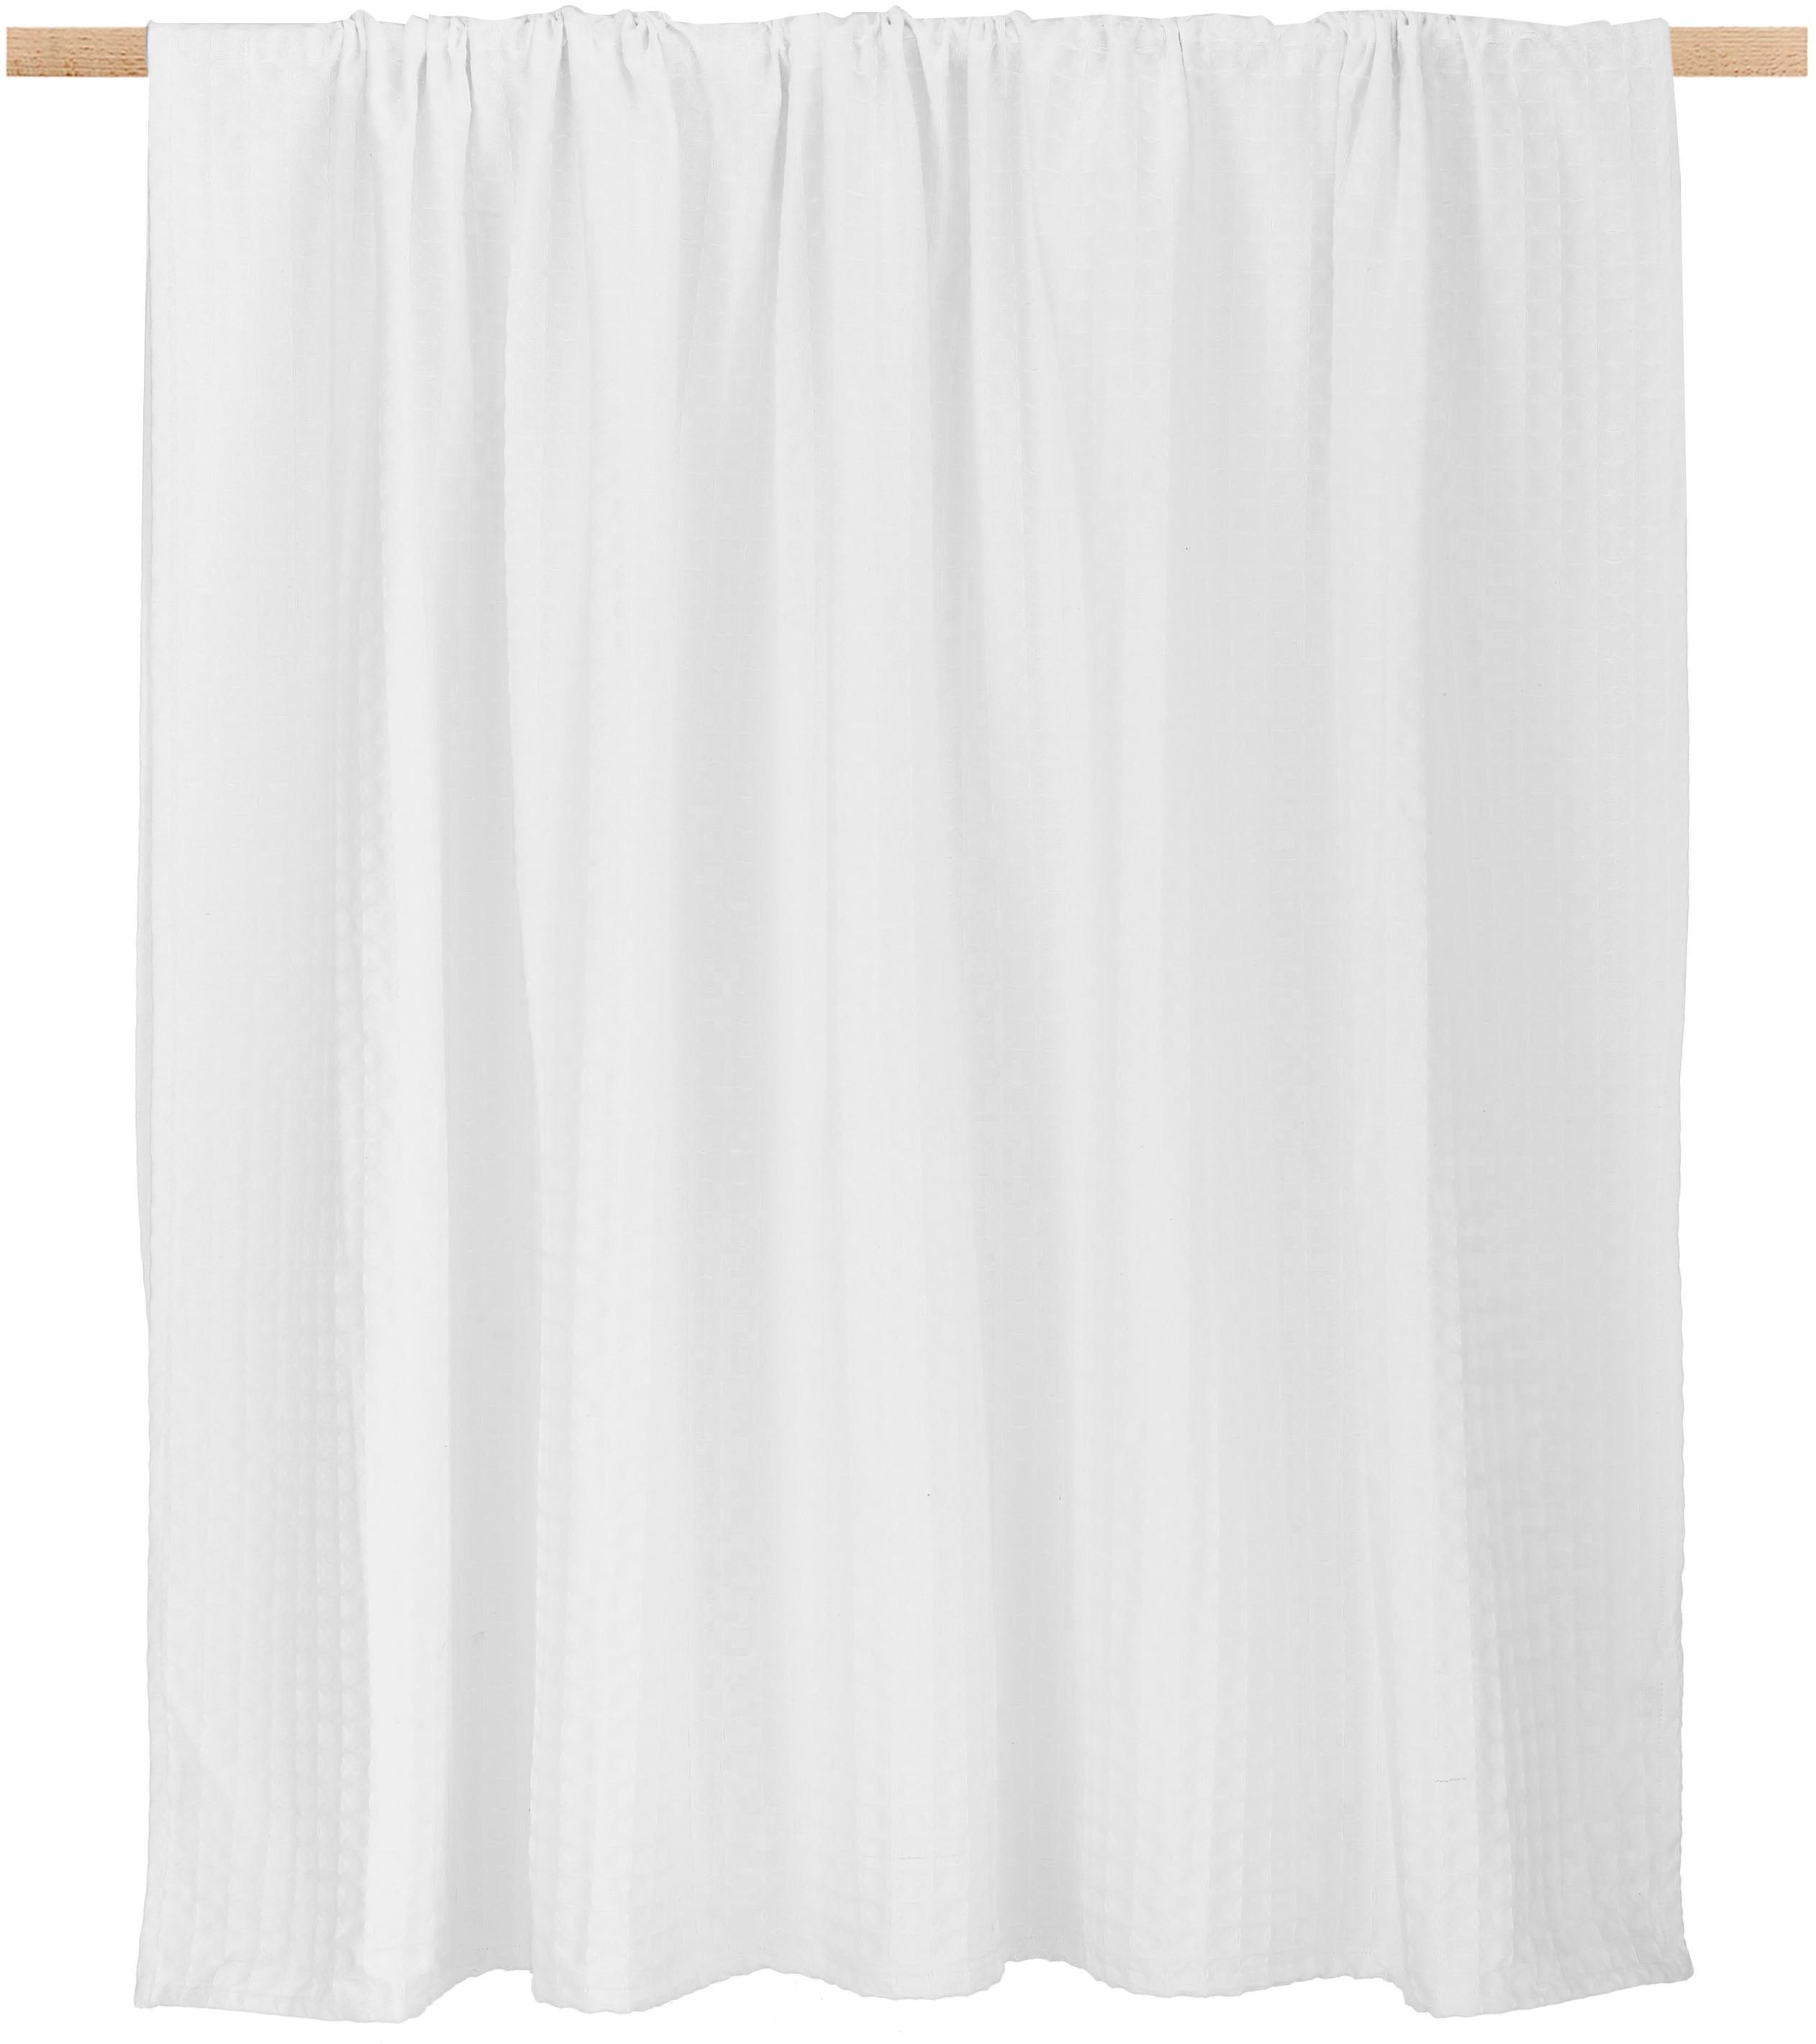 Waffelpiqué-Tagesdecke Panal, 100% Baumwolle, Weiss, 180 x 260 cm